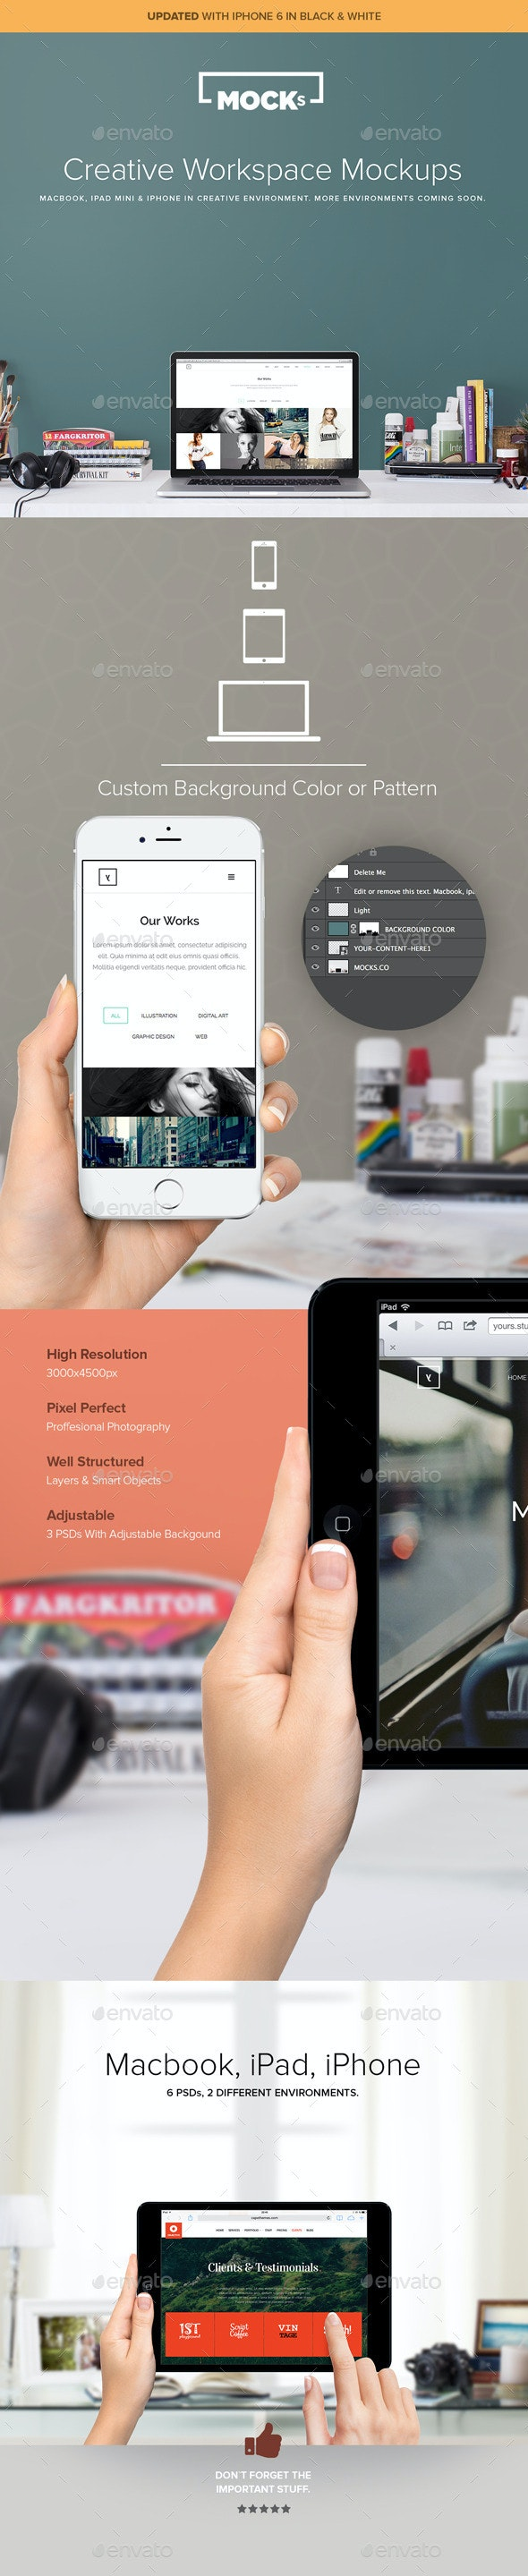 Macbook iPad & iPhone 6 Workspace Mockups - Displays Product Mock-Ups